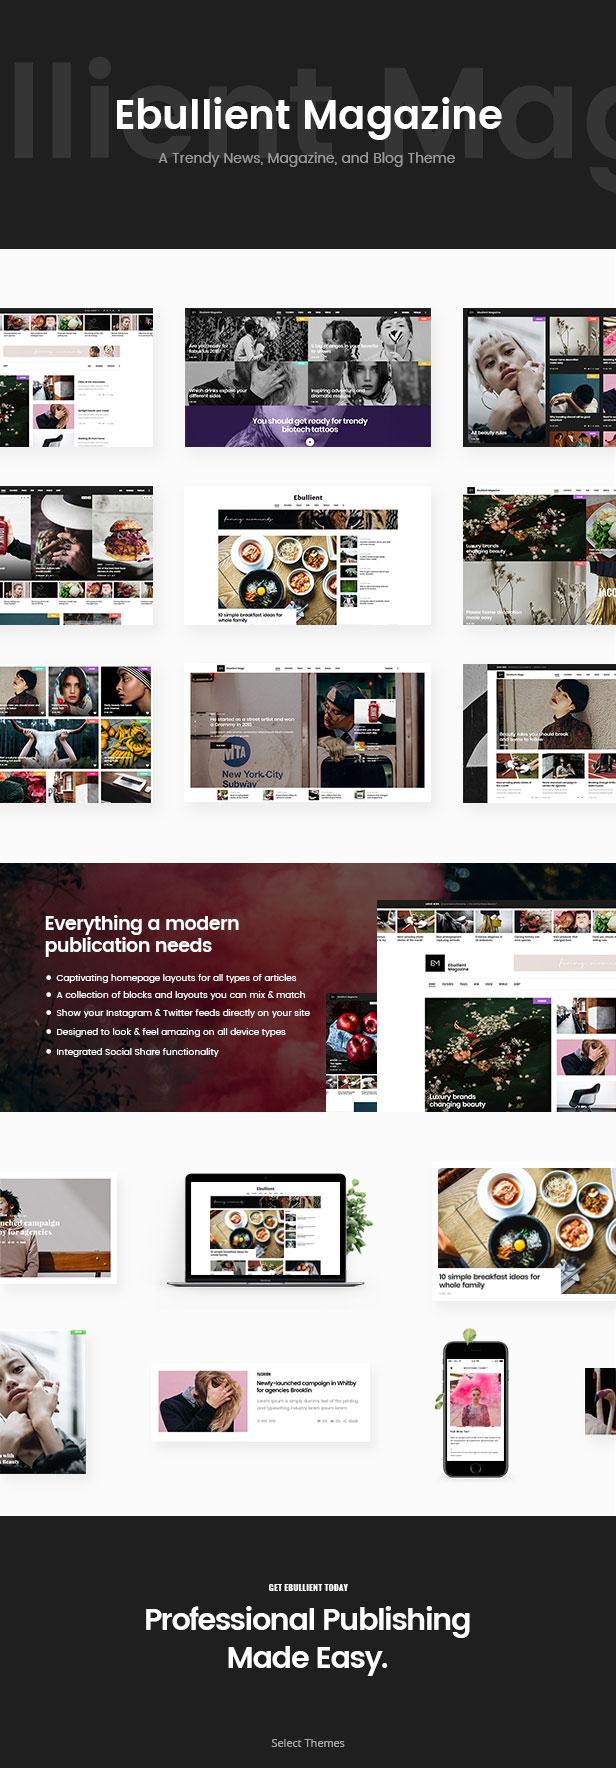 Ebullient - Modern News and Magazine Theme - 1